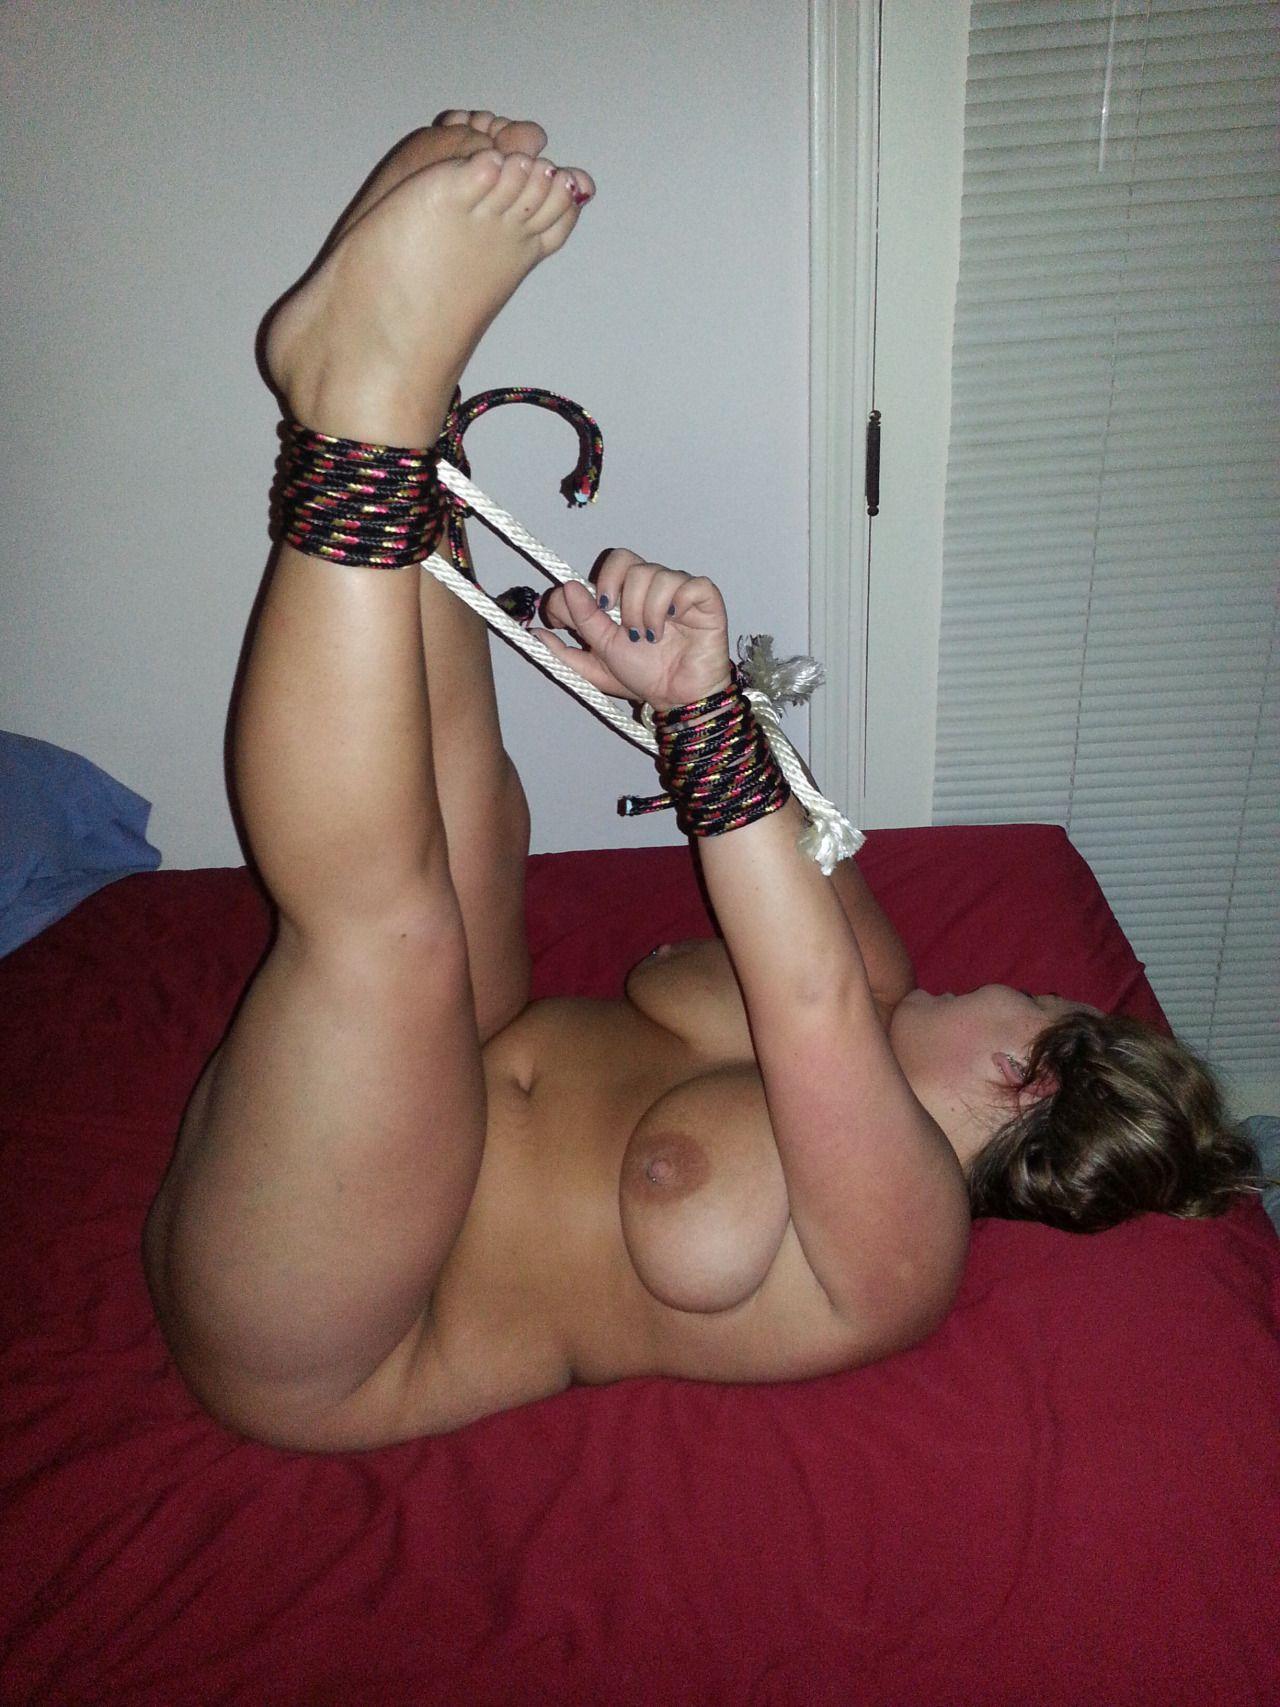 bbw bondage photos